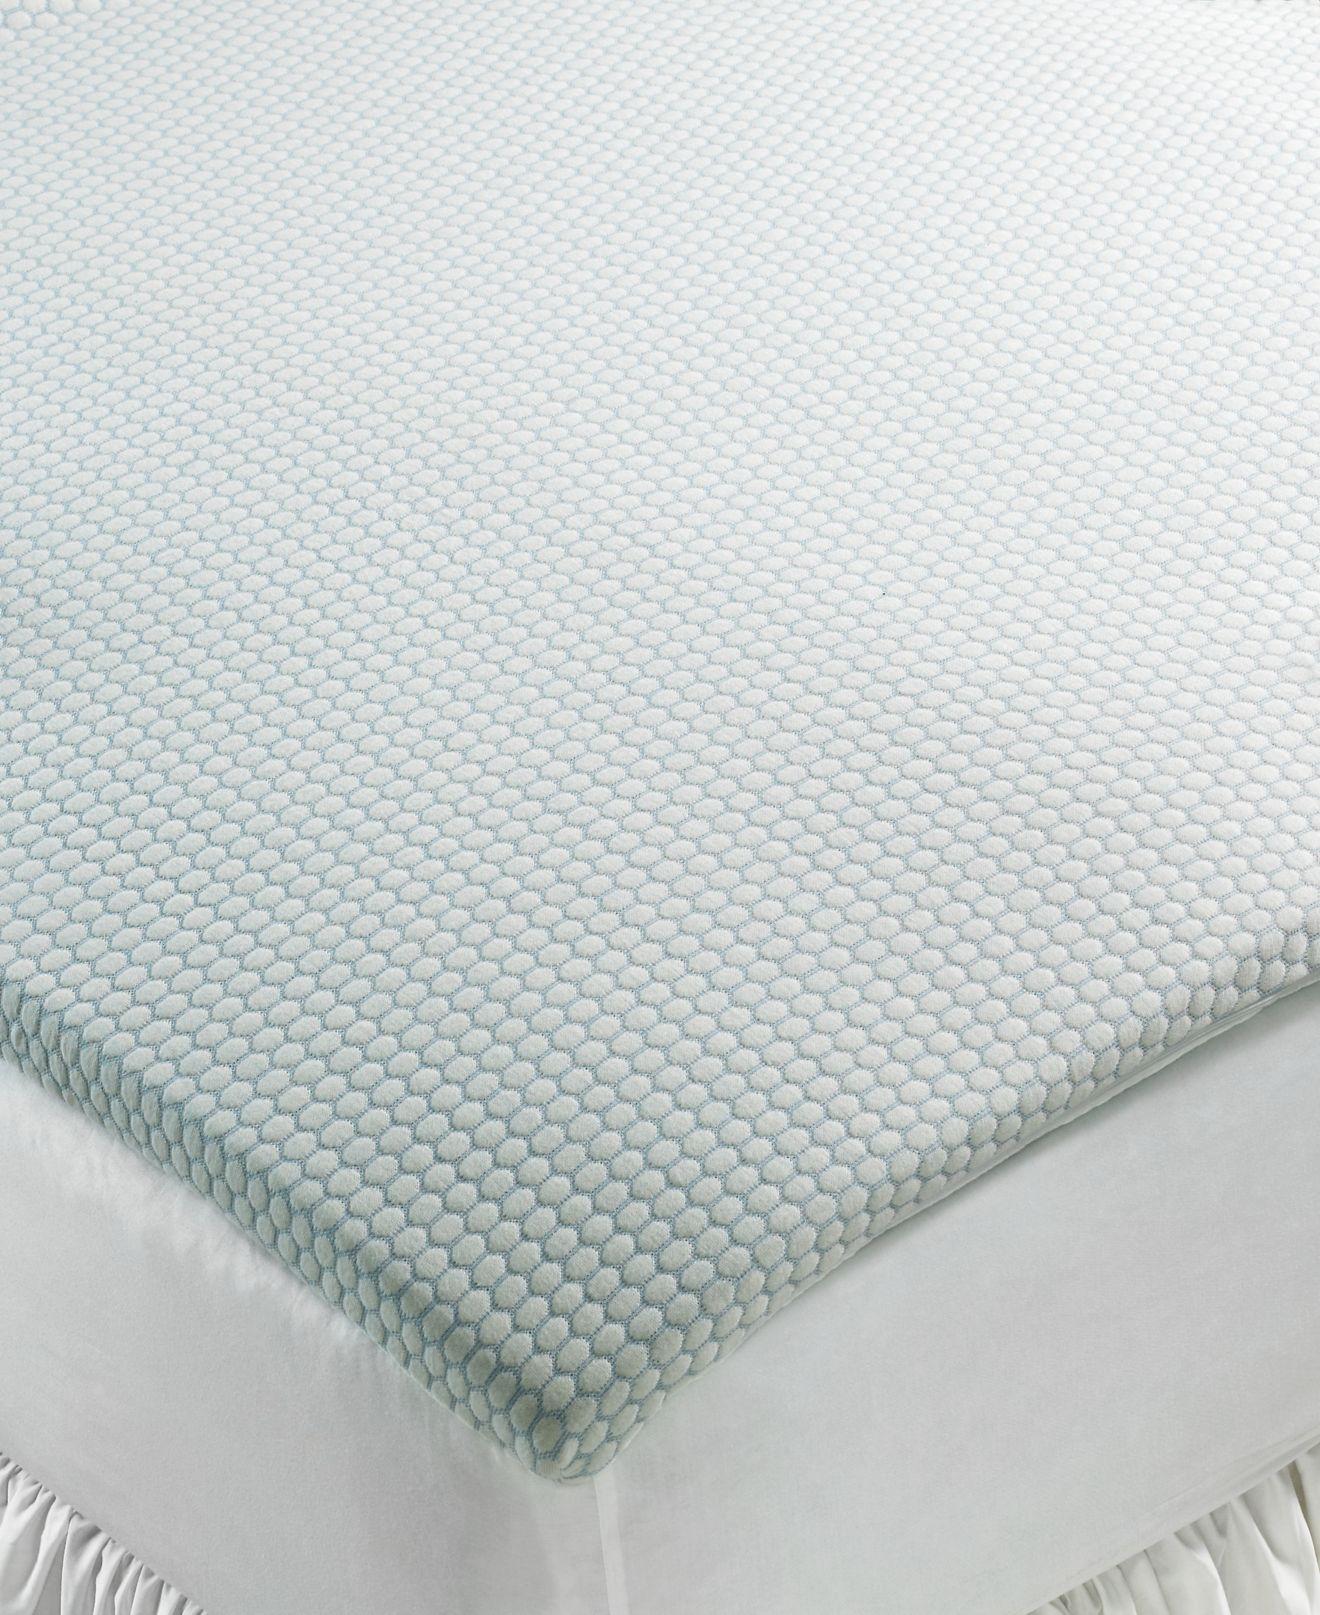 twin xl memory foam mattress topper bed bath and beyond - bedding